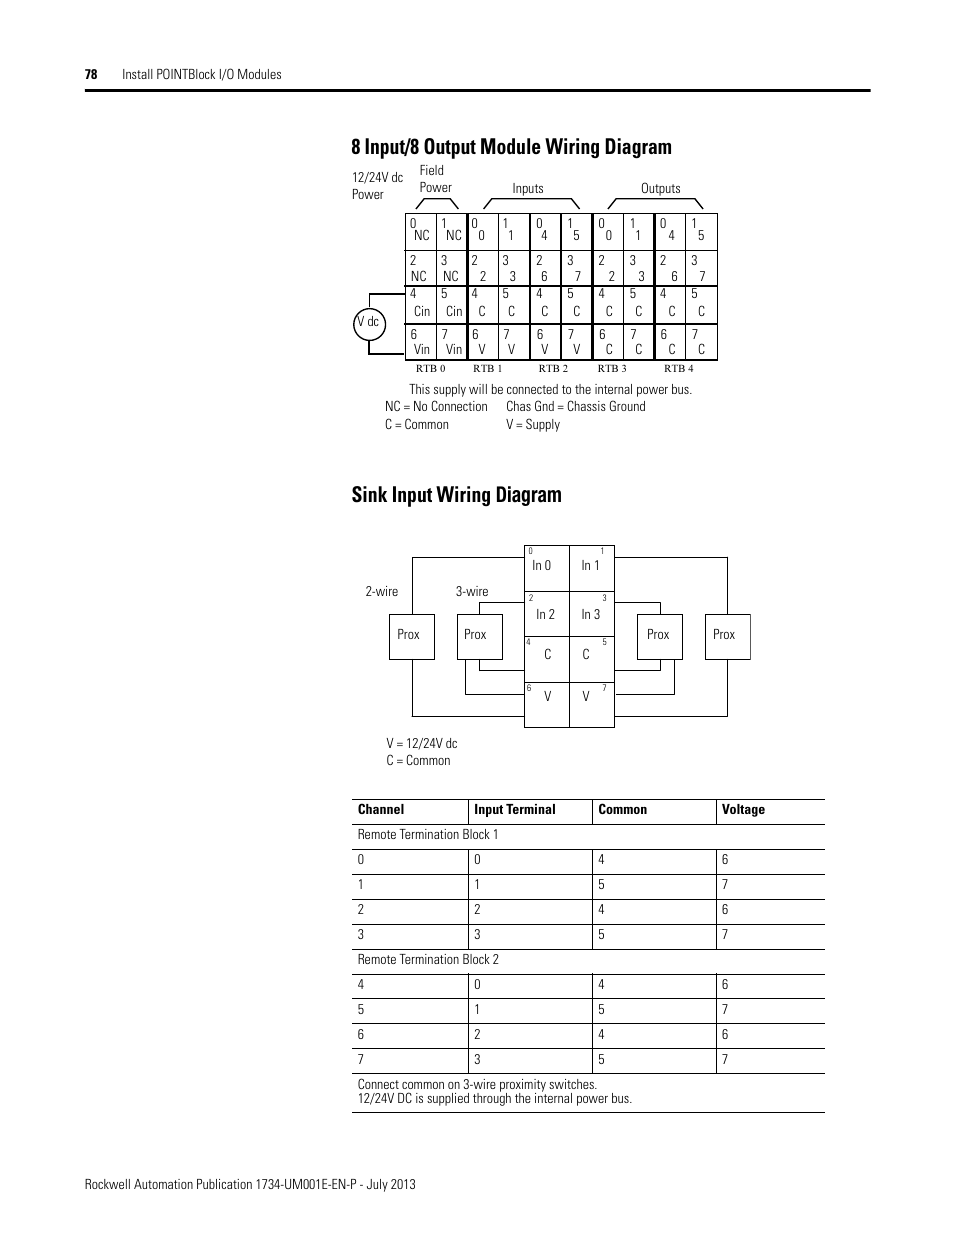 8 Input  8 Output Module Wiring Diagram  Sink Input Wiring